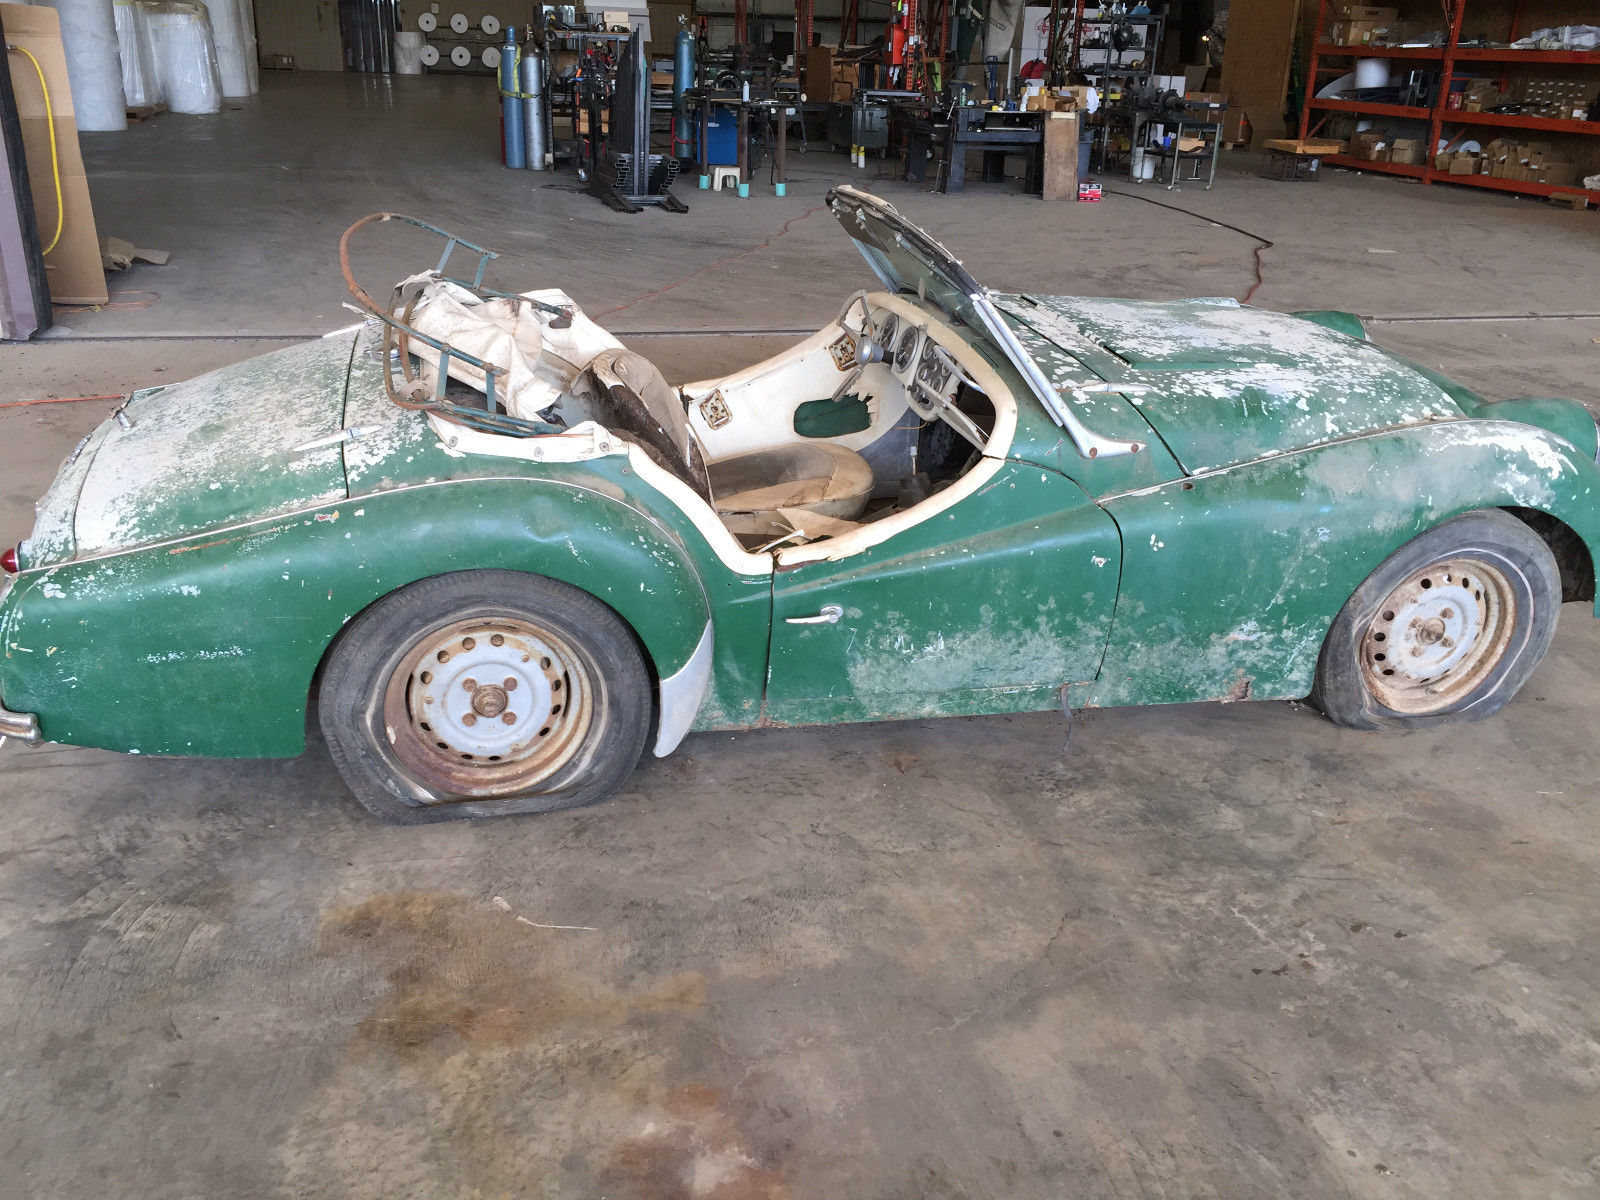 1958 Triumph Tr3a Project Car For Sale: 1961 Triumph TR3 Roadster Project Restoration For Sale